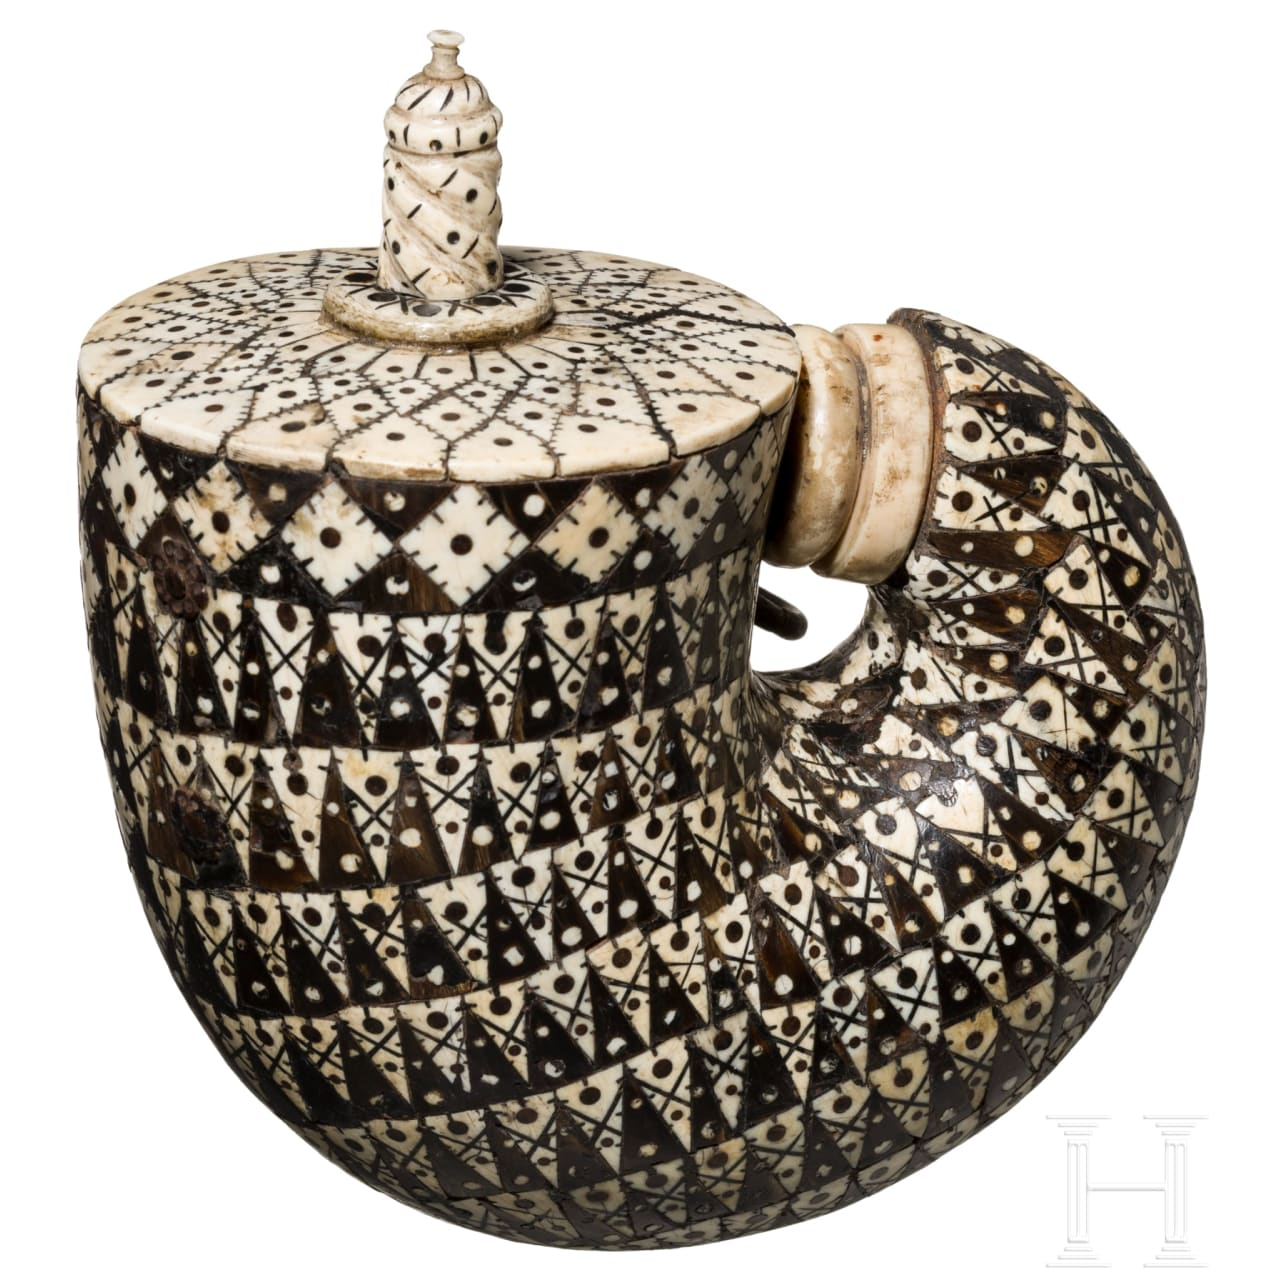 An Indian powder flask, Mogul empire, 18th century